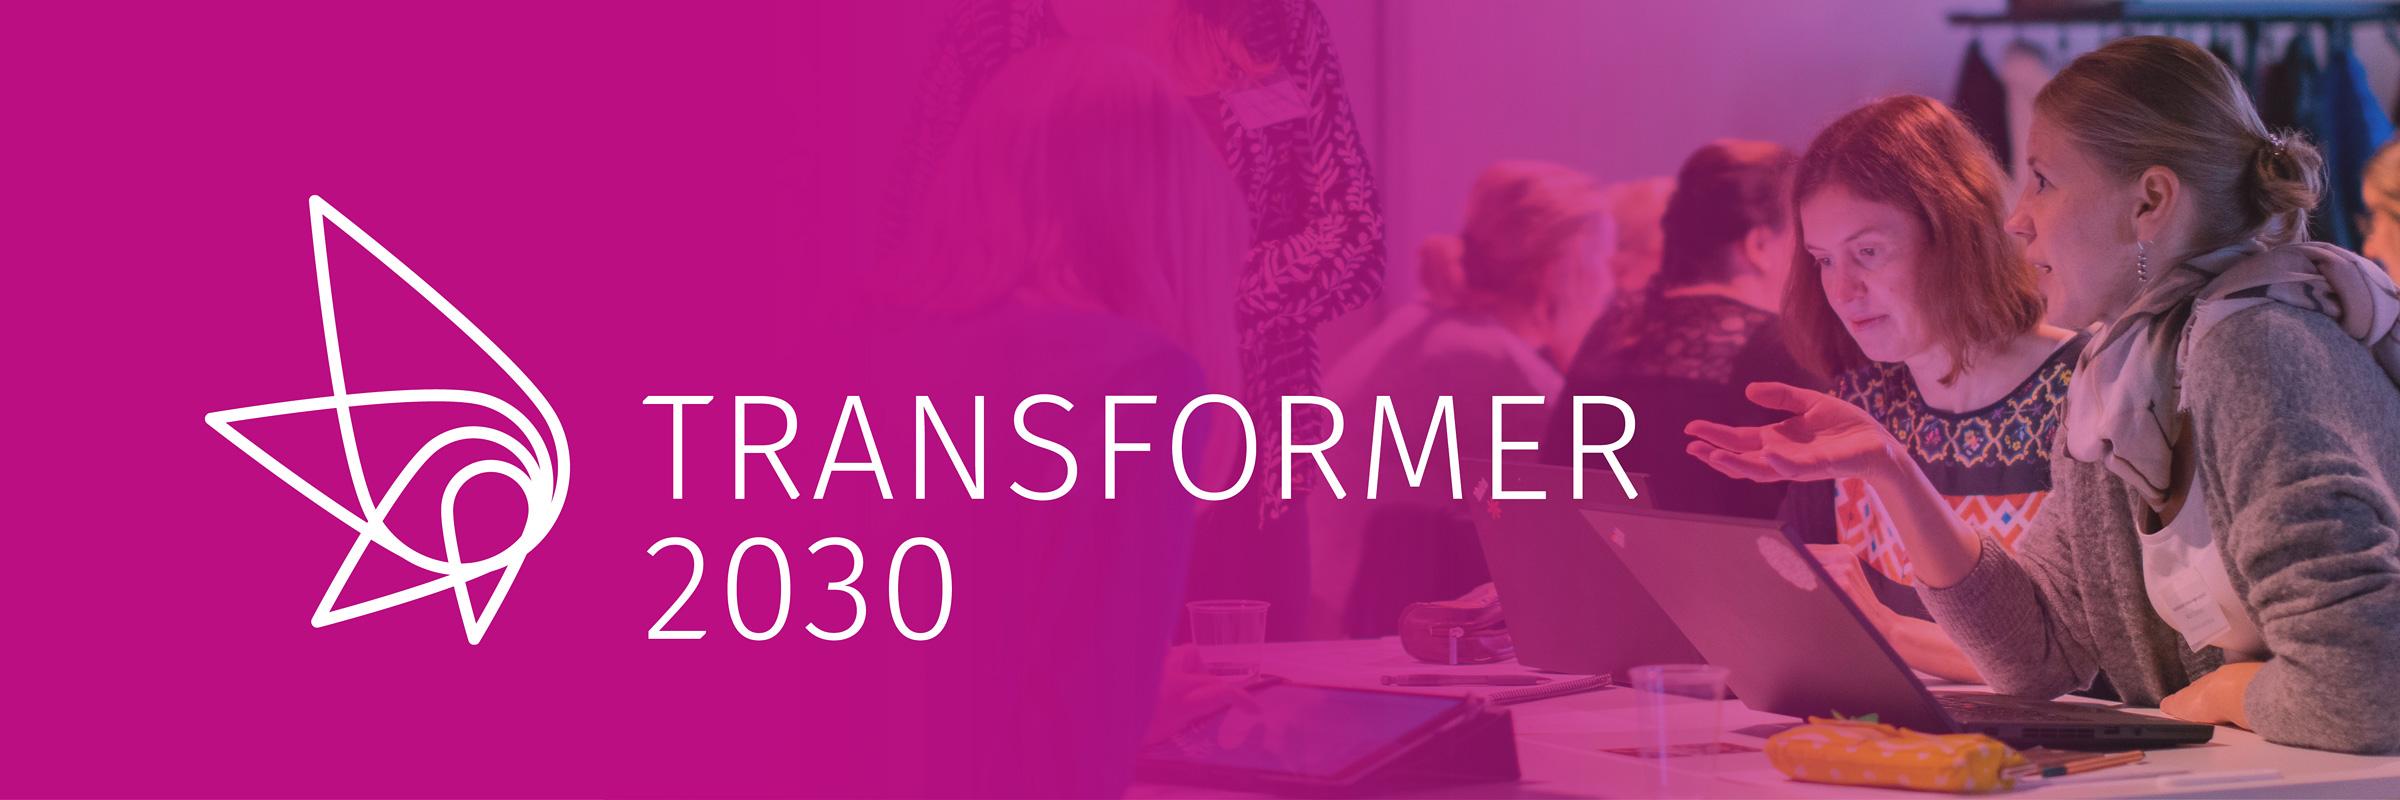 Transformer 2030 -hankkeen kuvituskuva, jossa logo.